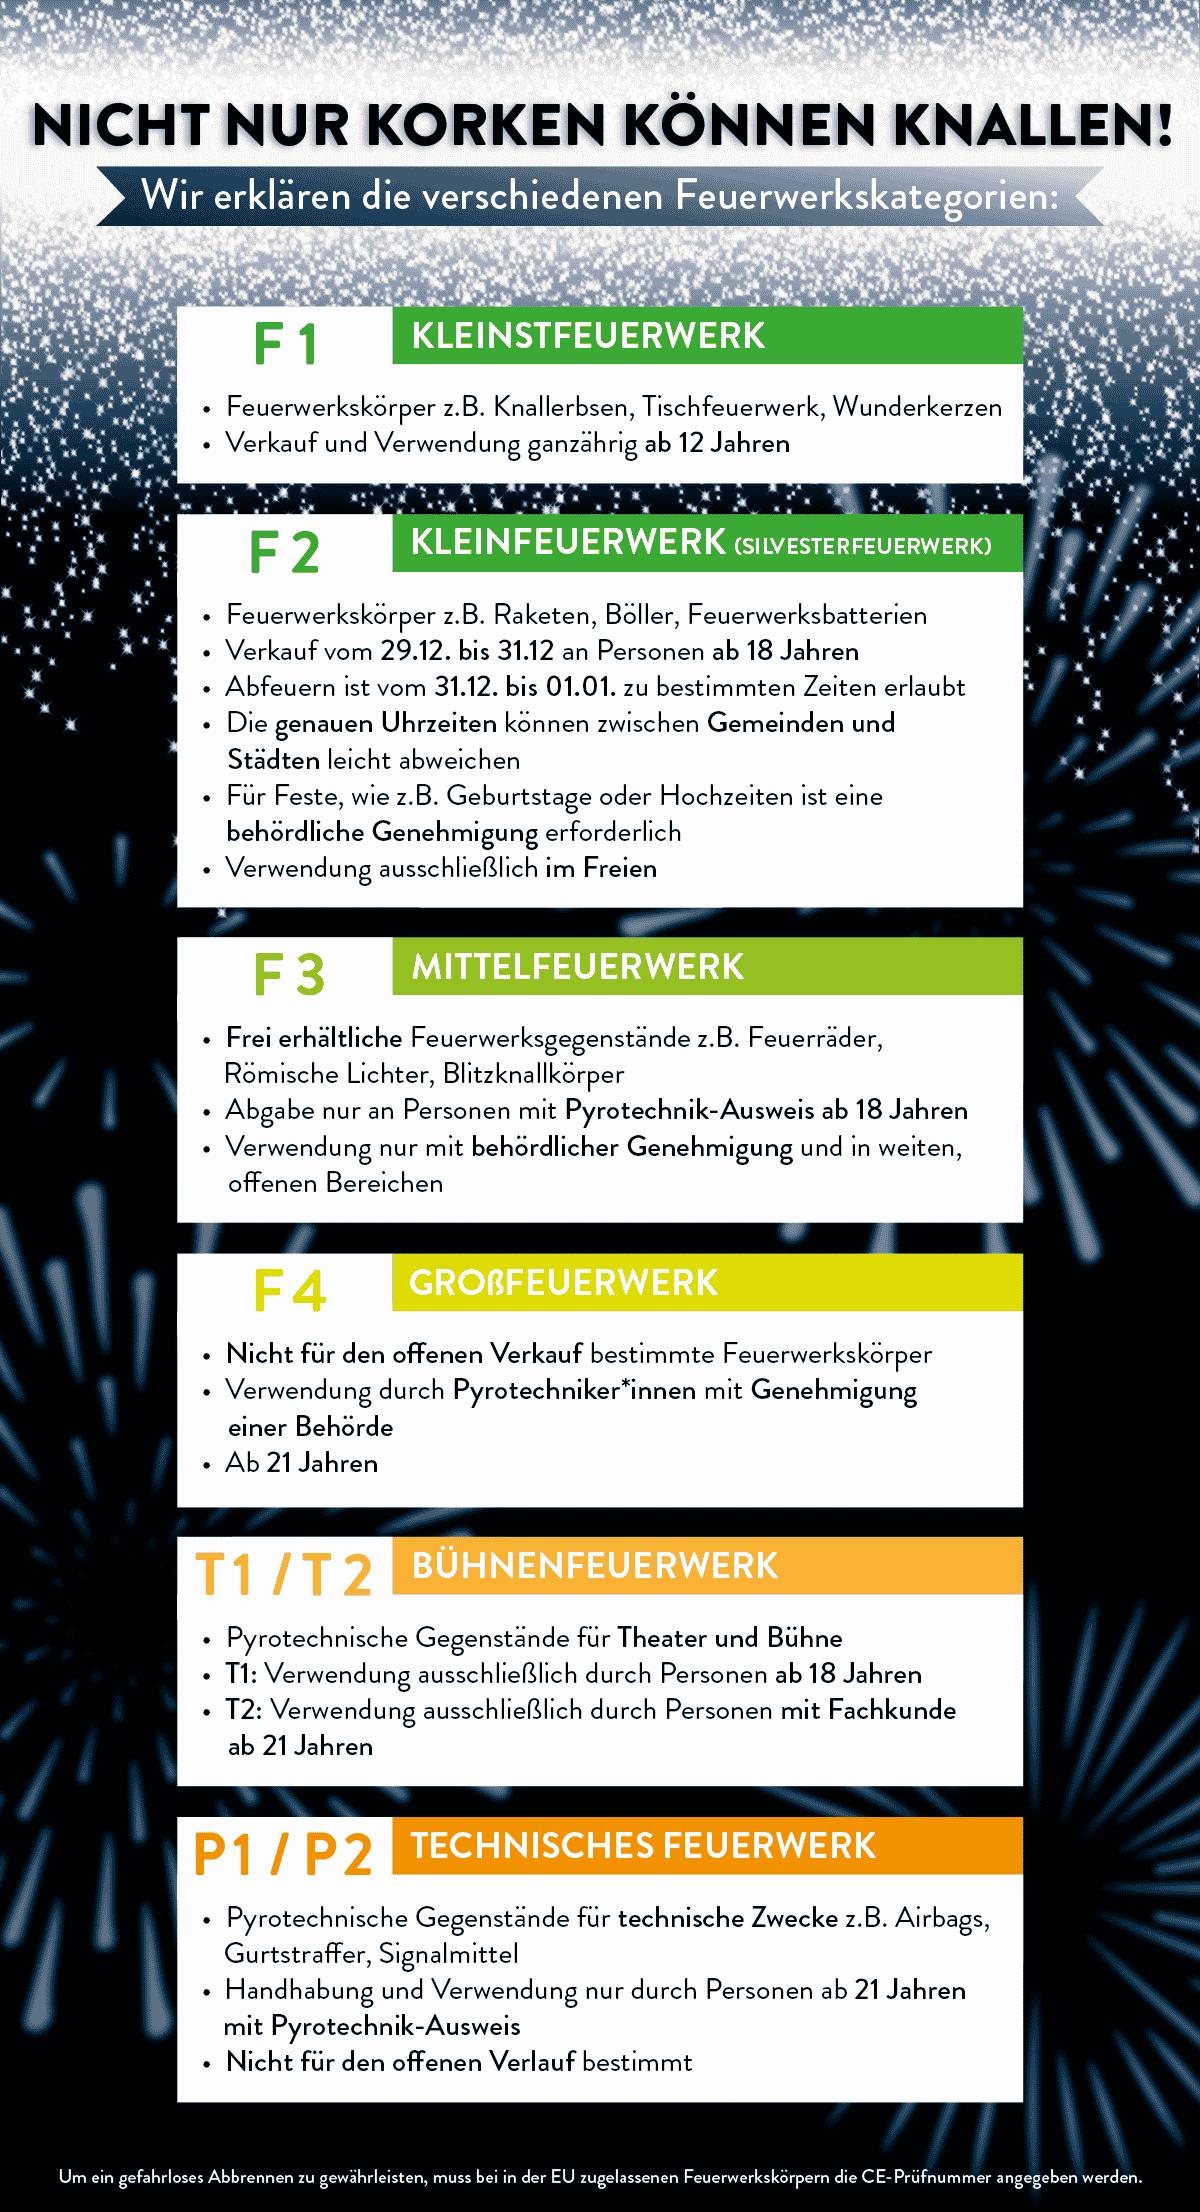 Infografik zu den Feuerwerkskategorien